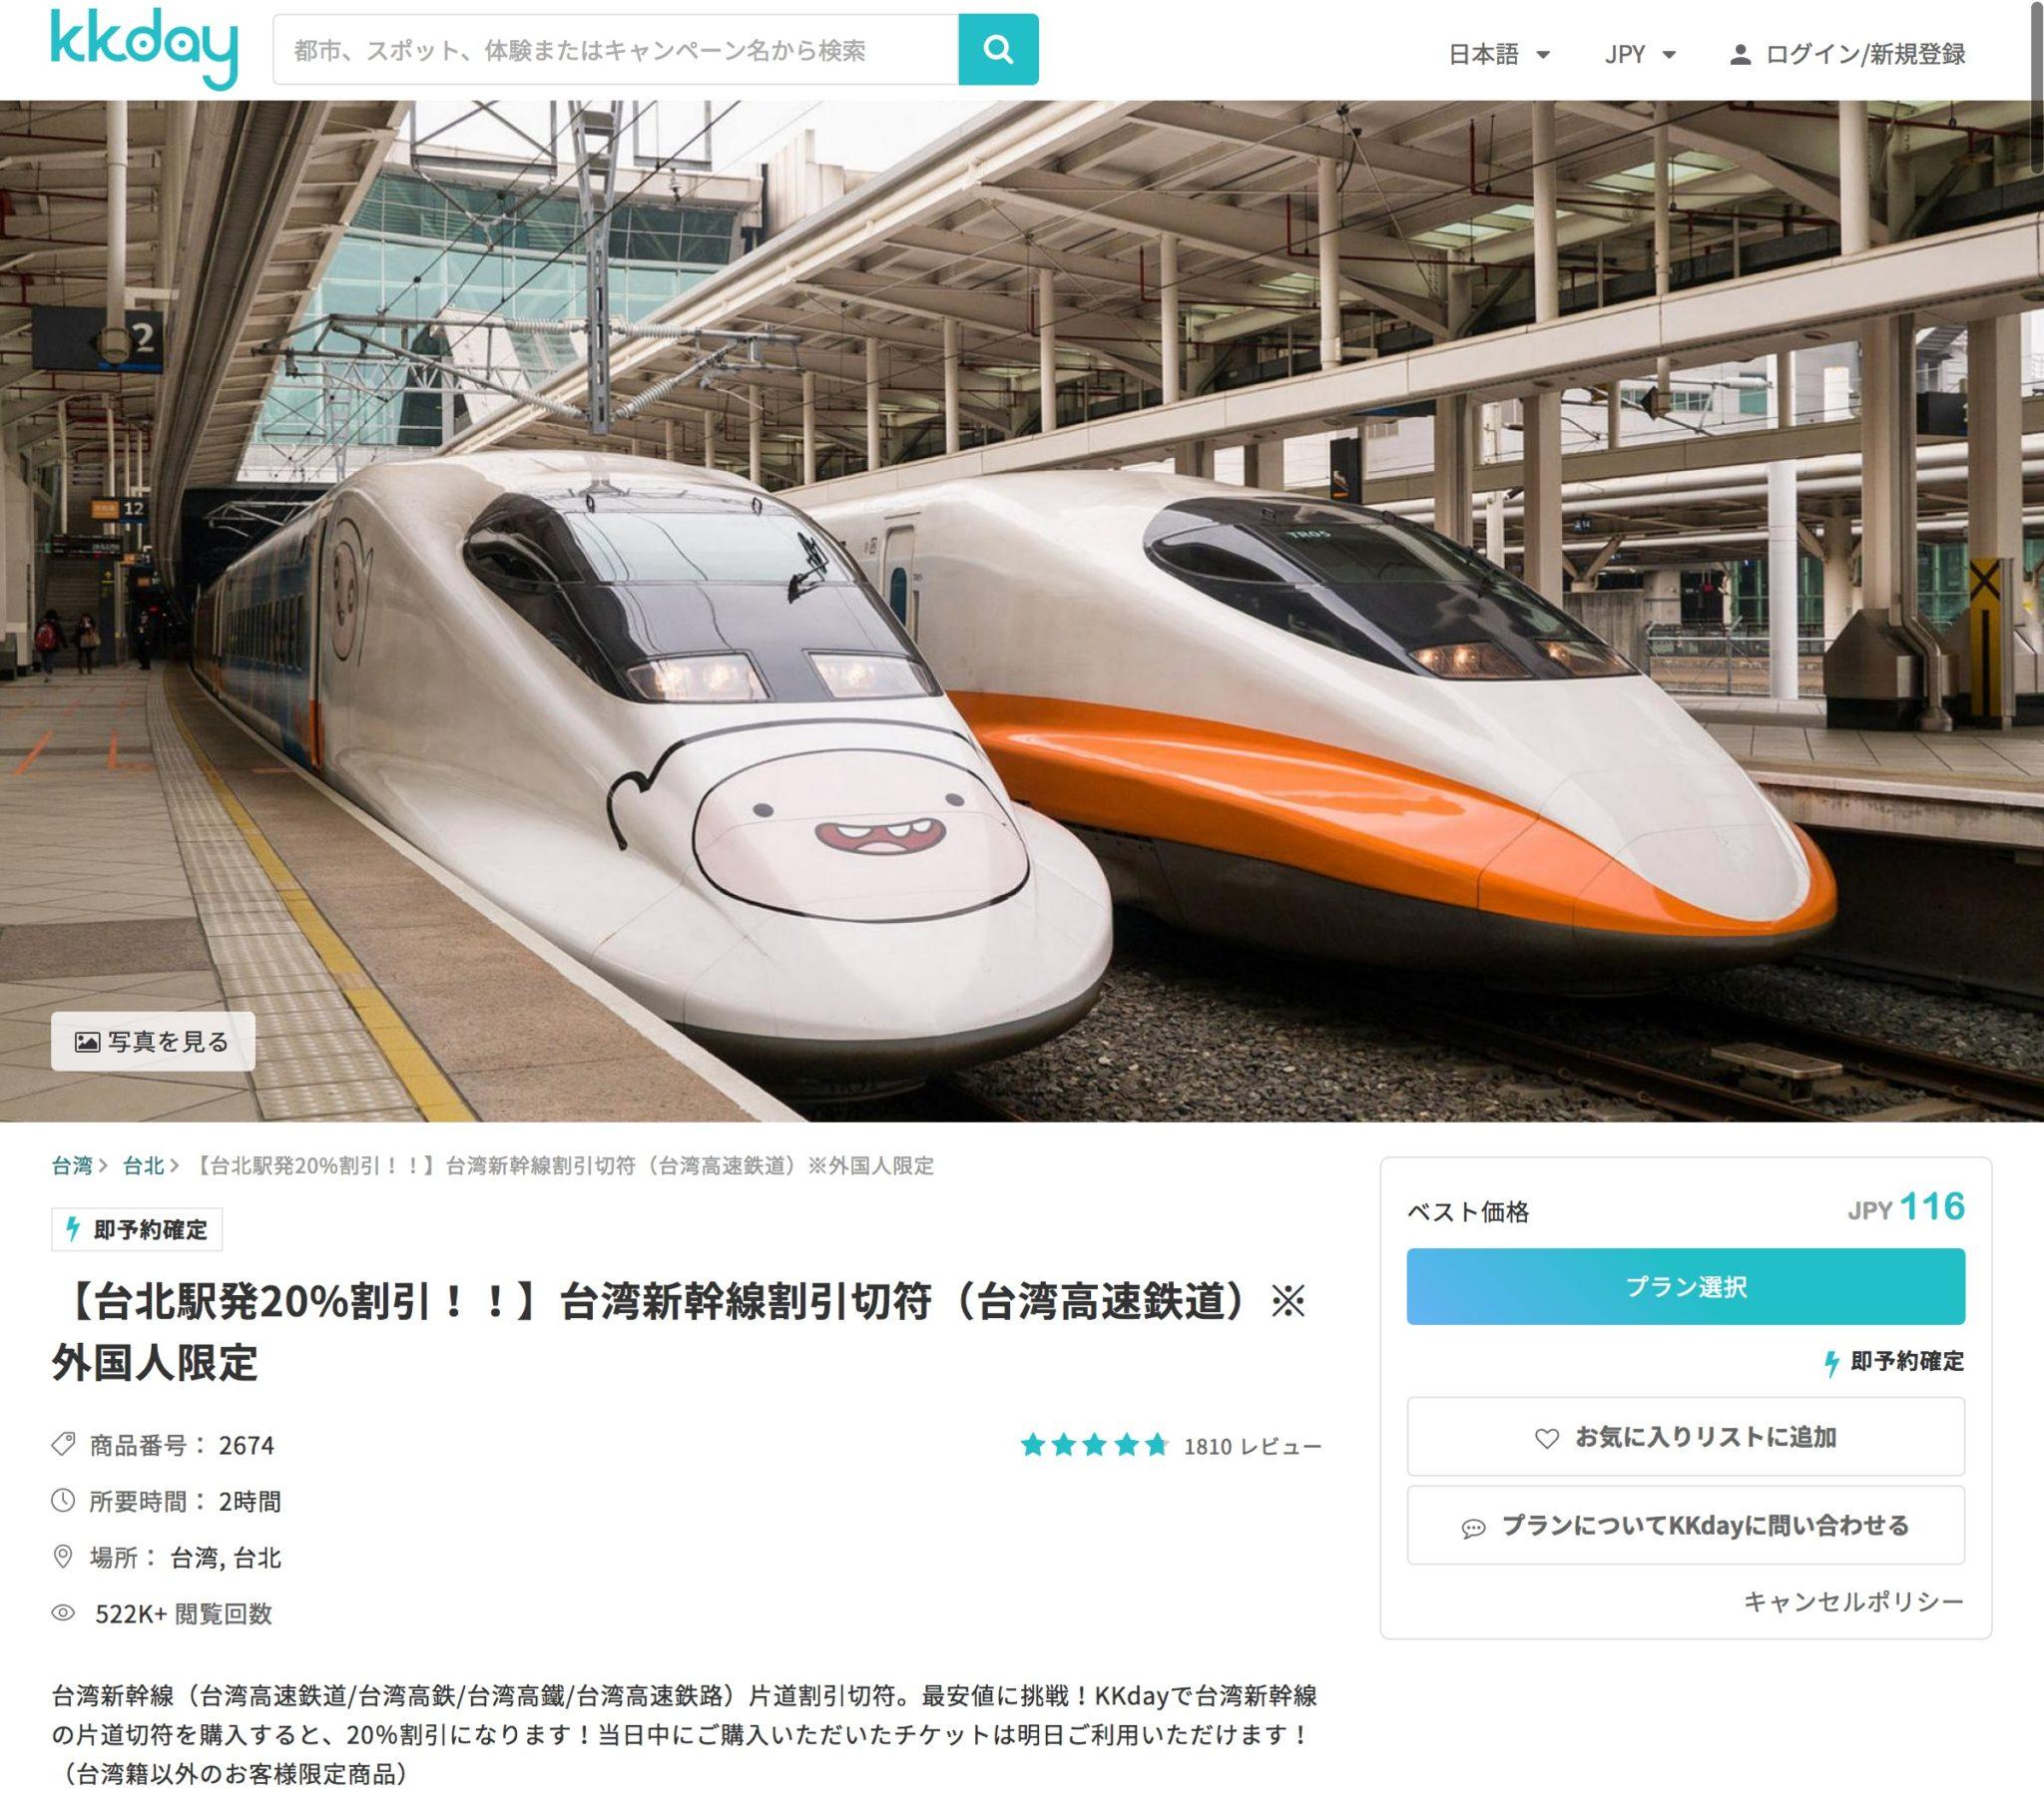 kkday 台湾新幹線の切符の買い方・手順